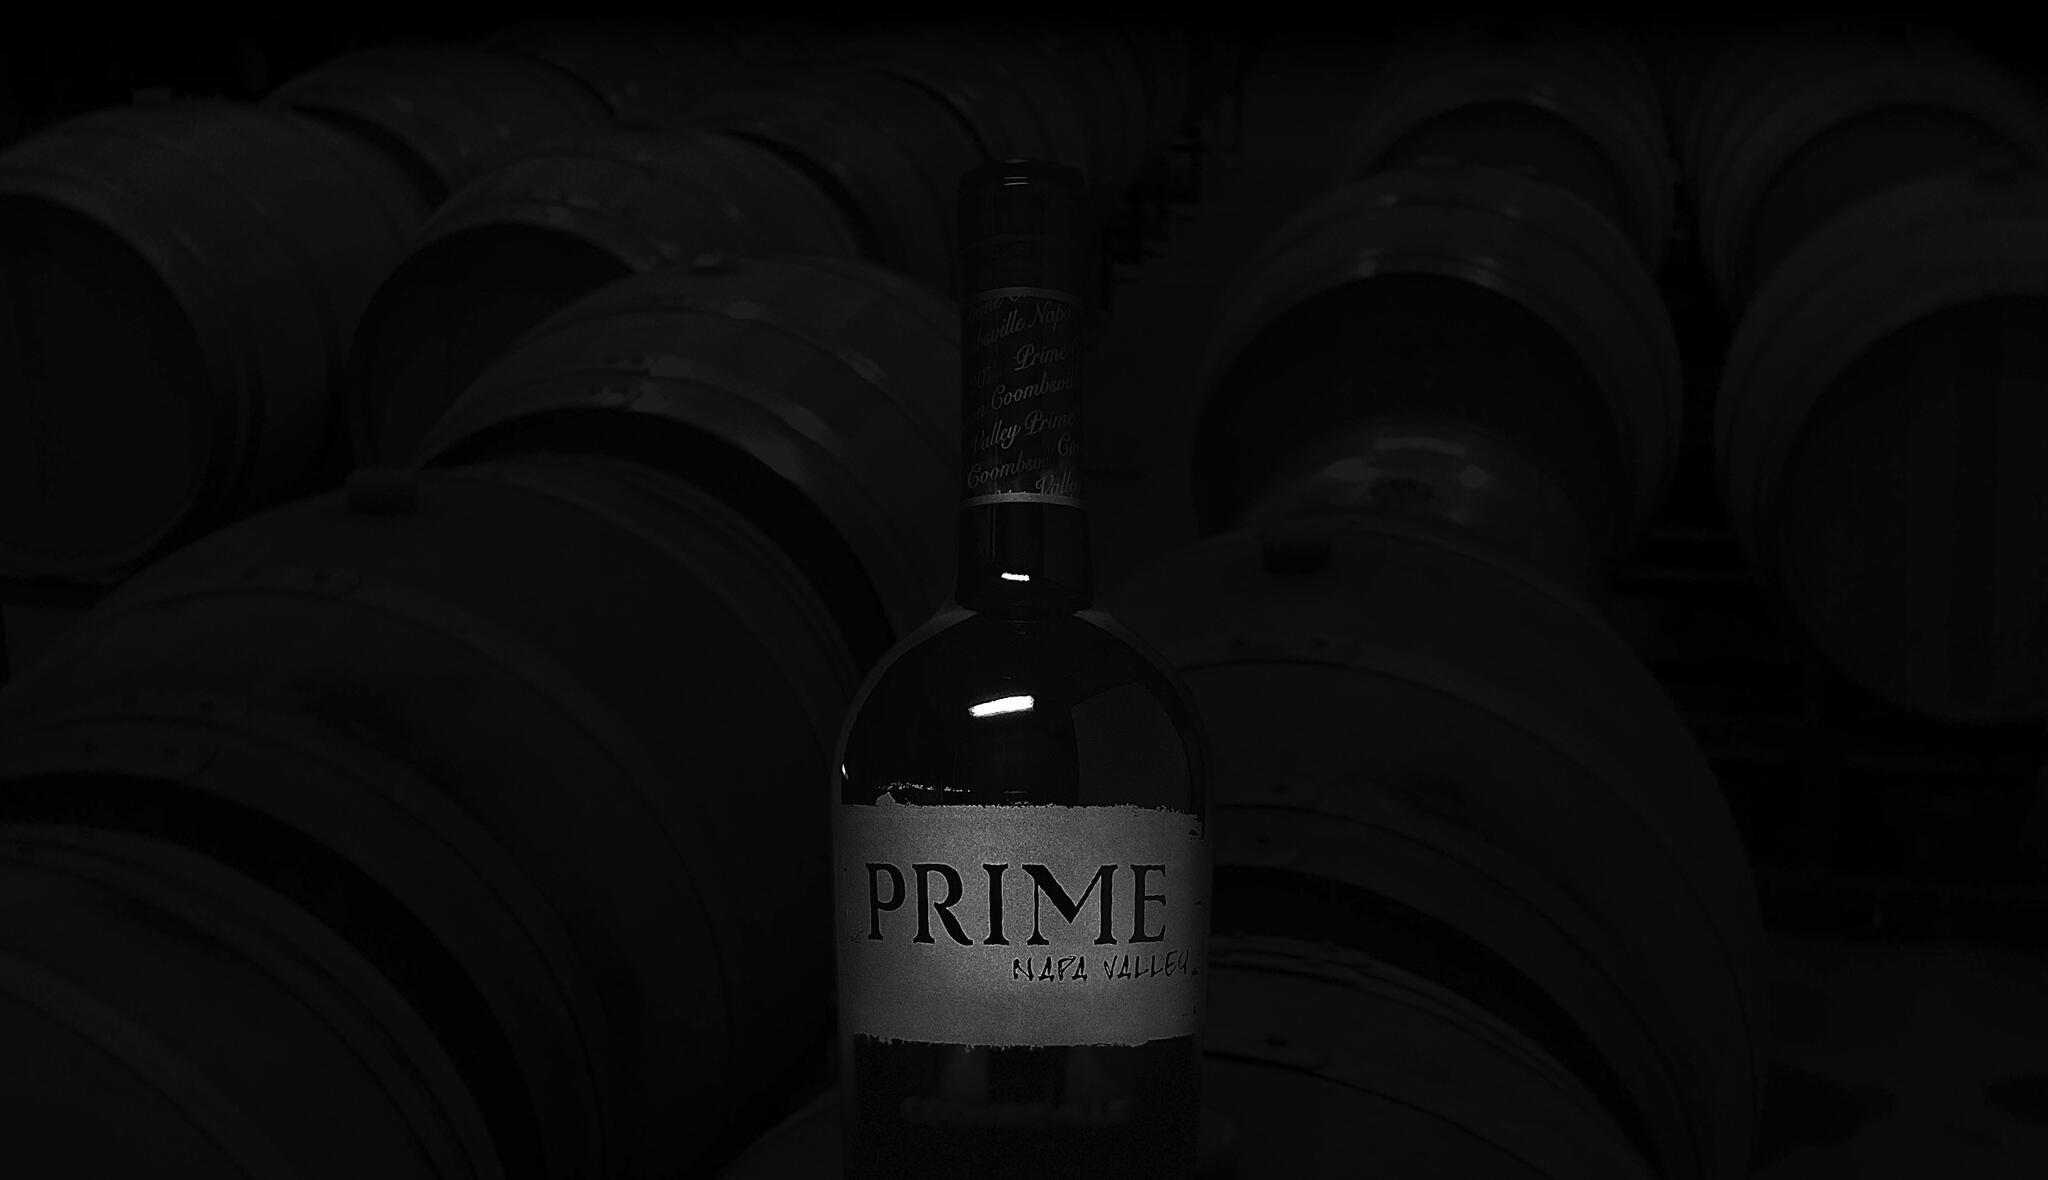 Prime Cellars Cover Image